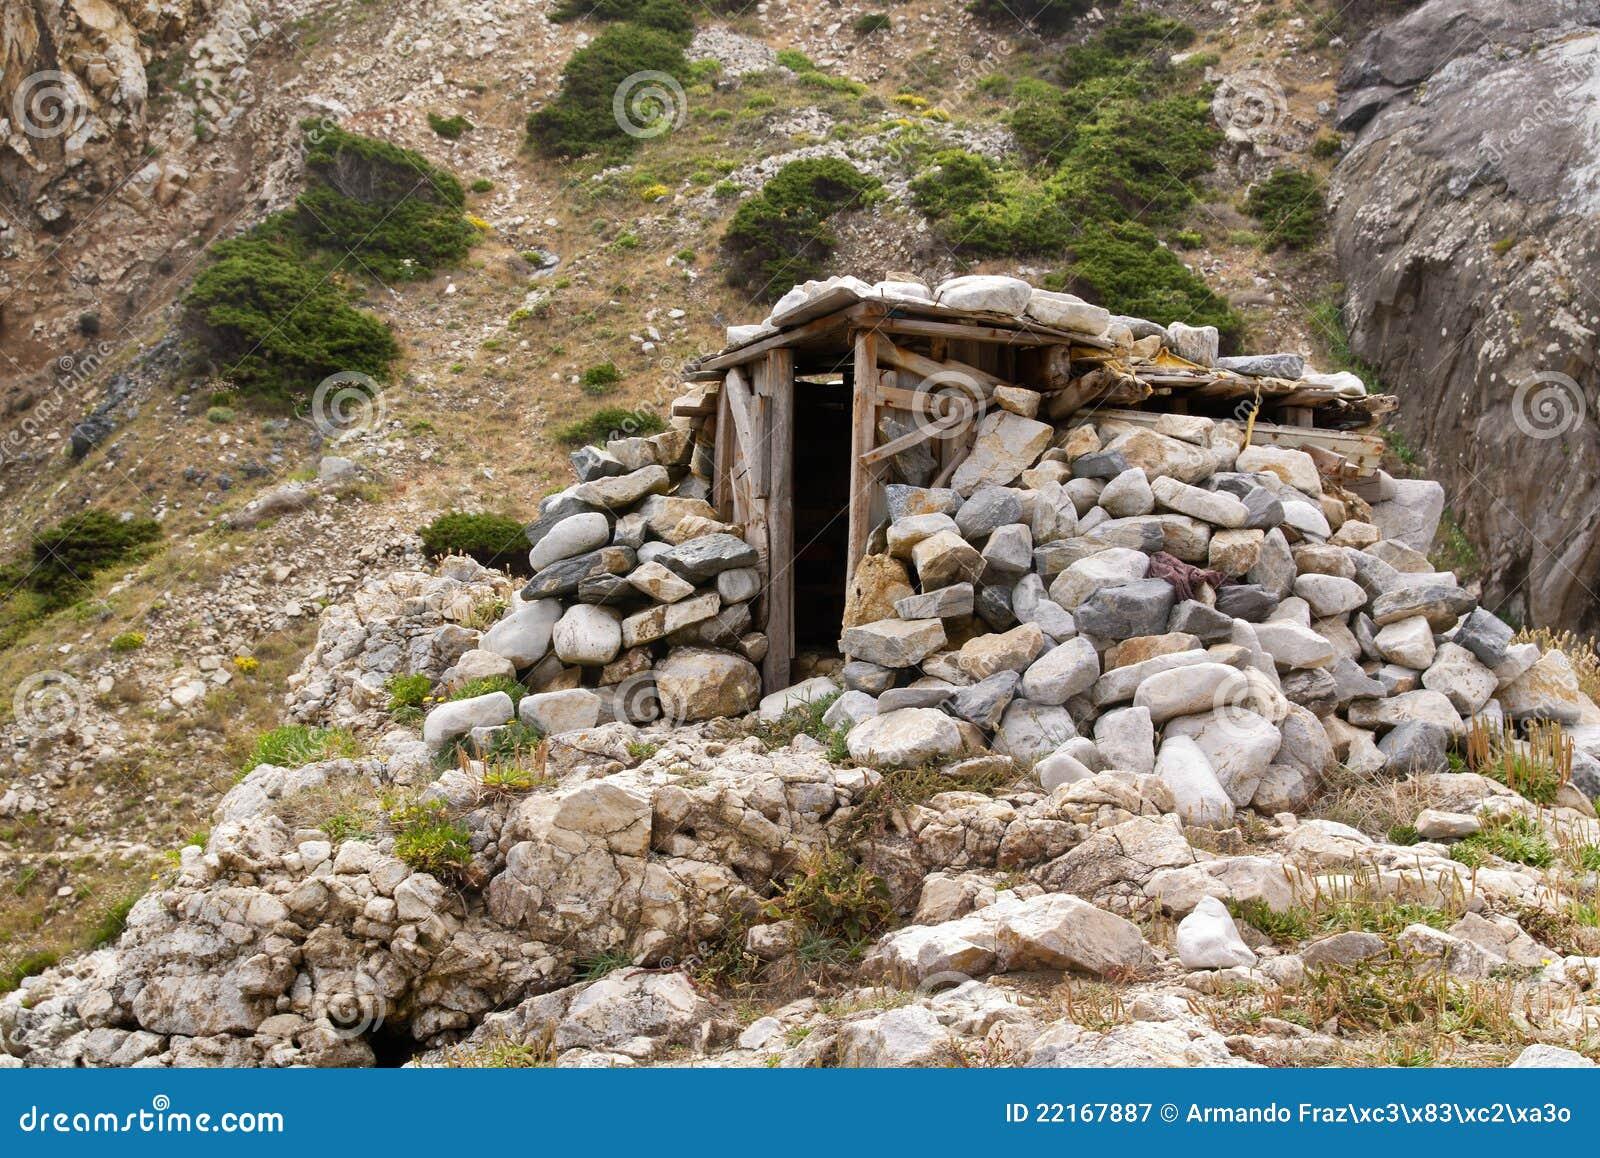 wood and stone shelter stock image image of slope portugal 22167887. Black Bedroom Furniture Sets. Home Design Ideas